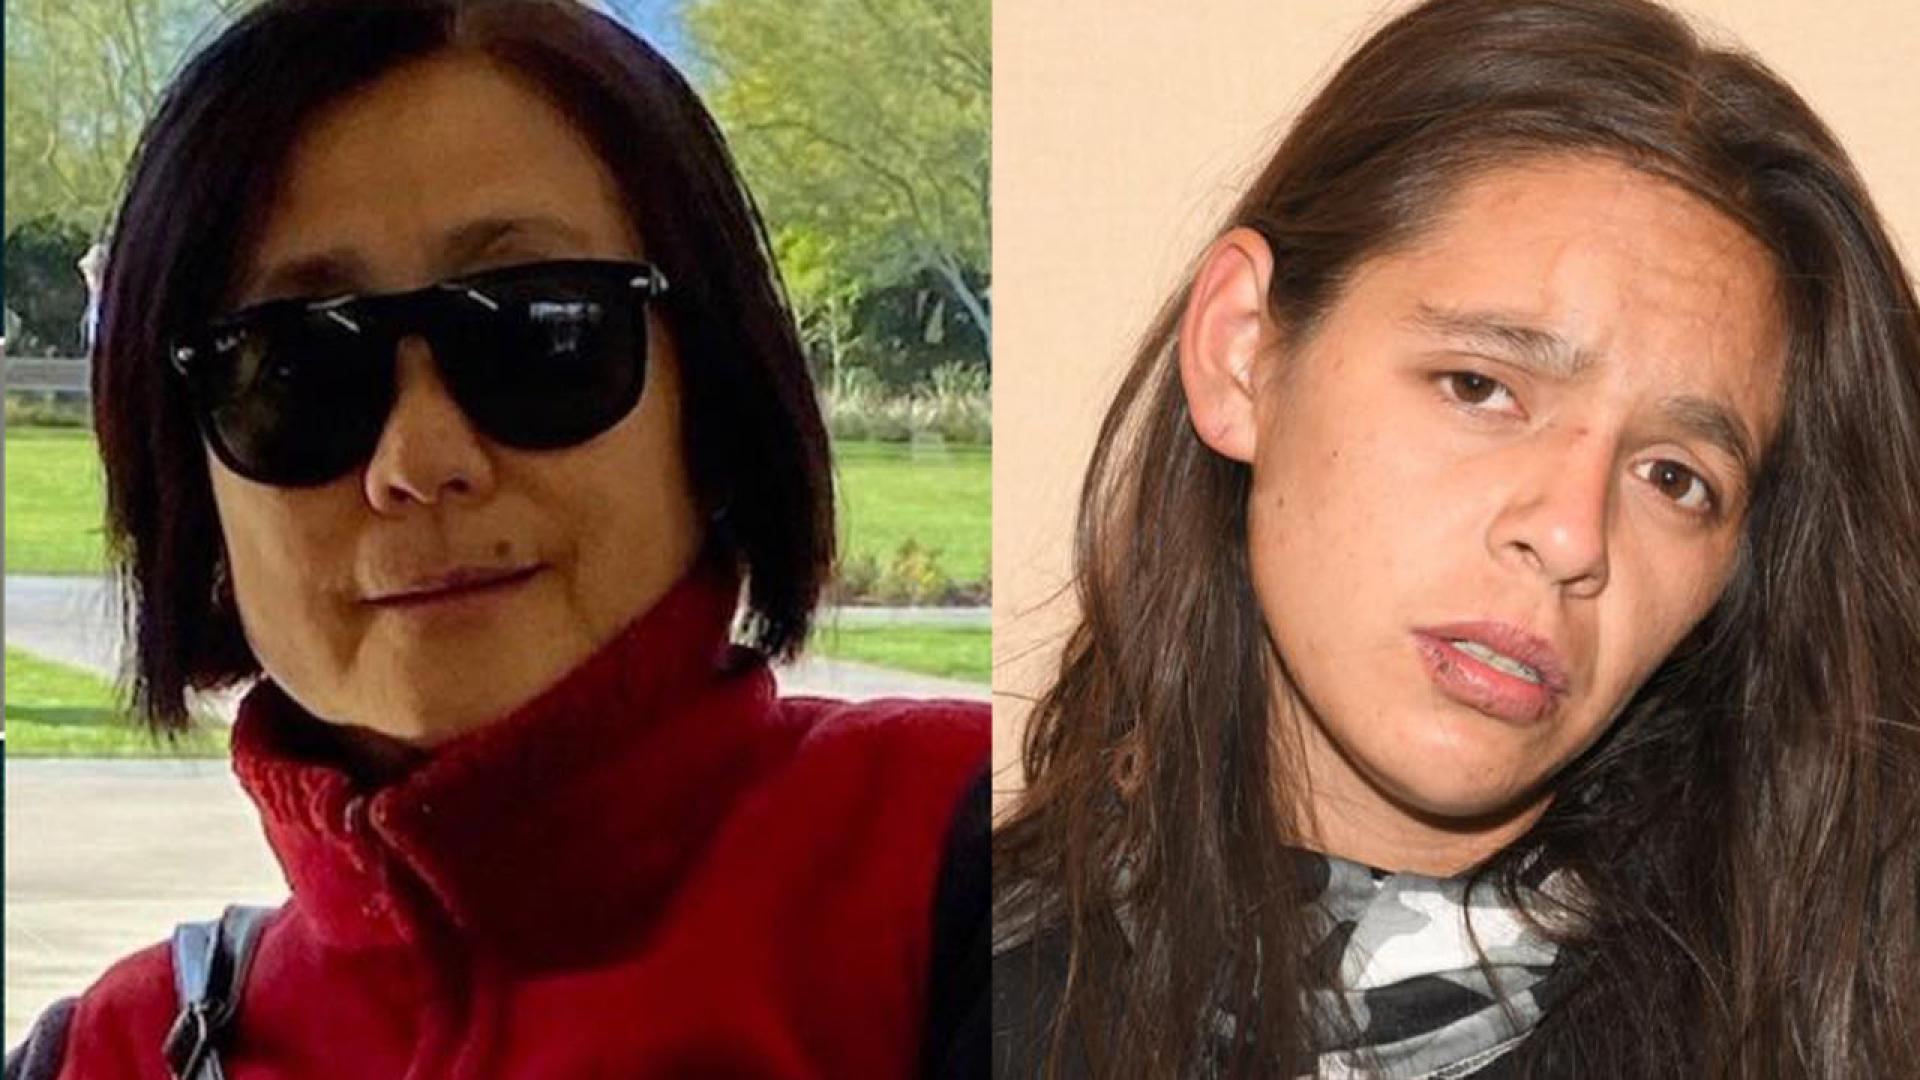 Ke Chieh Meng, 64, of Riverside was fatally stabbed by alleged suspect, Darlene Stephanie Montoya, 23.